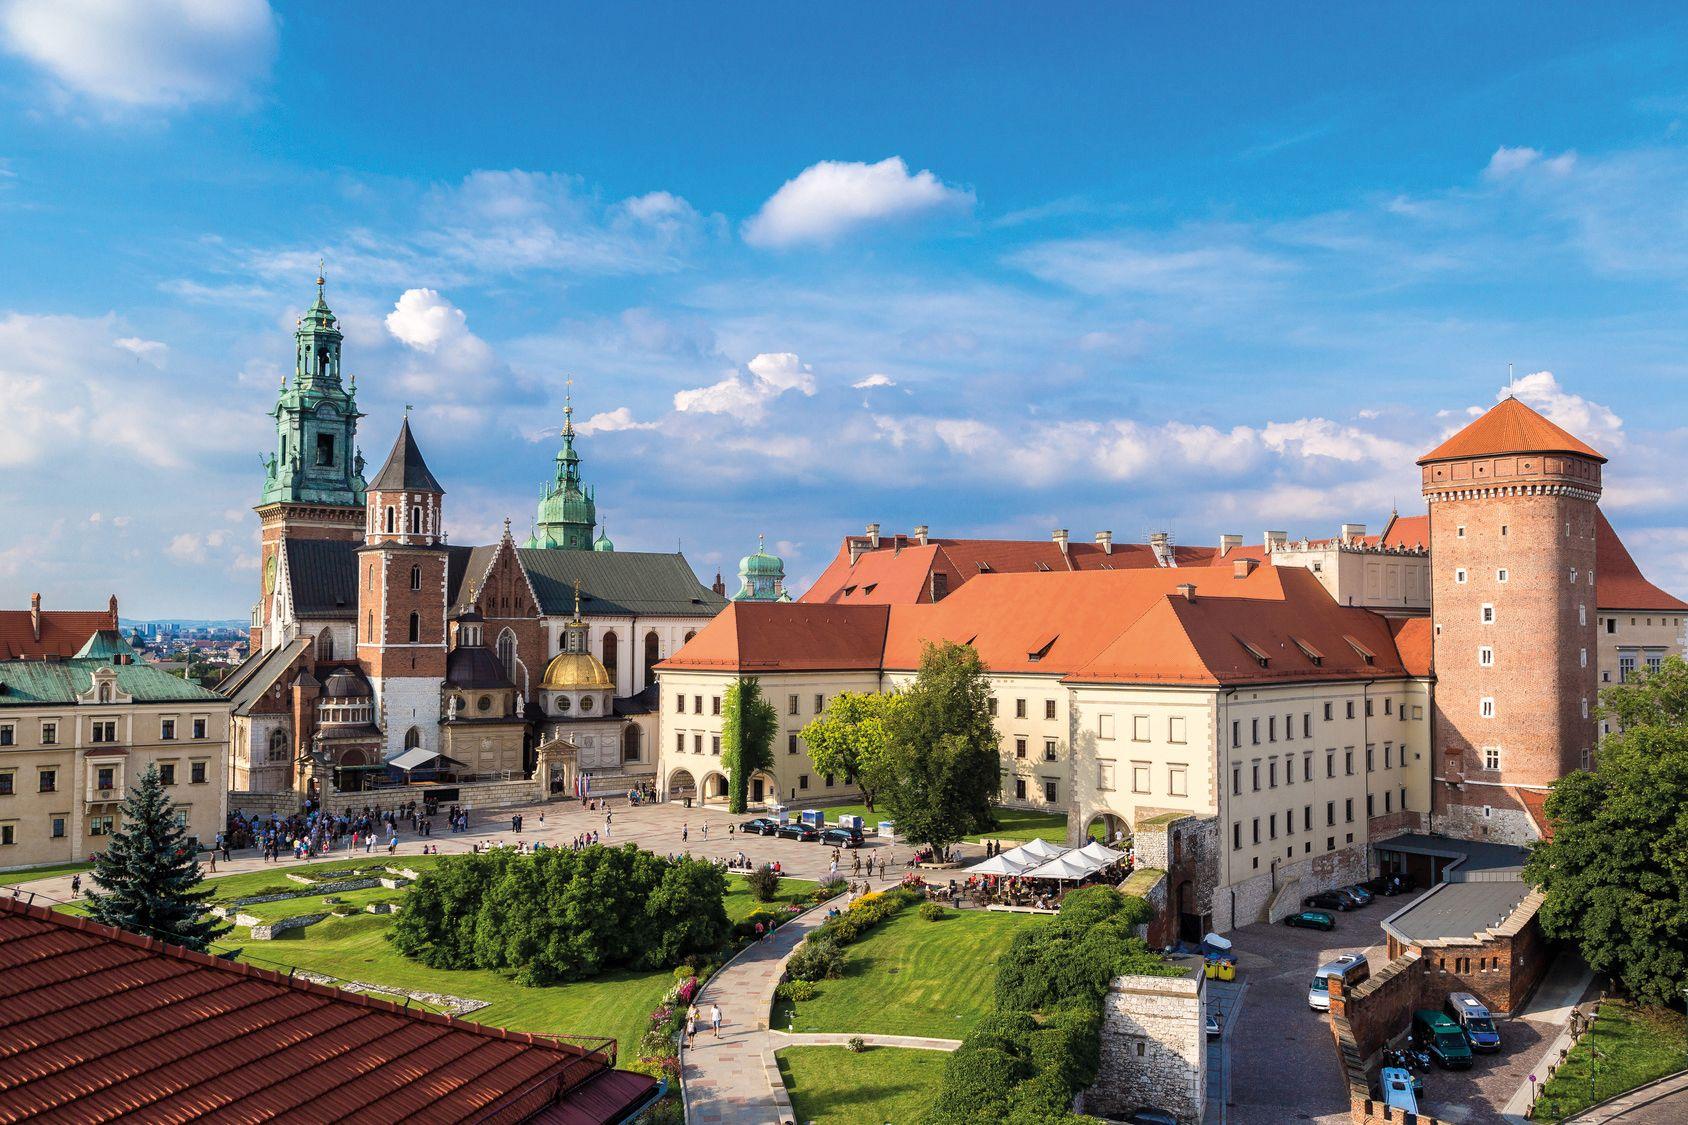 Krakau Wawel1